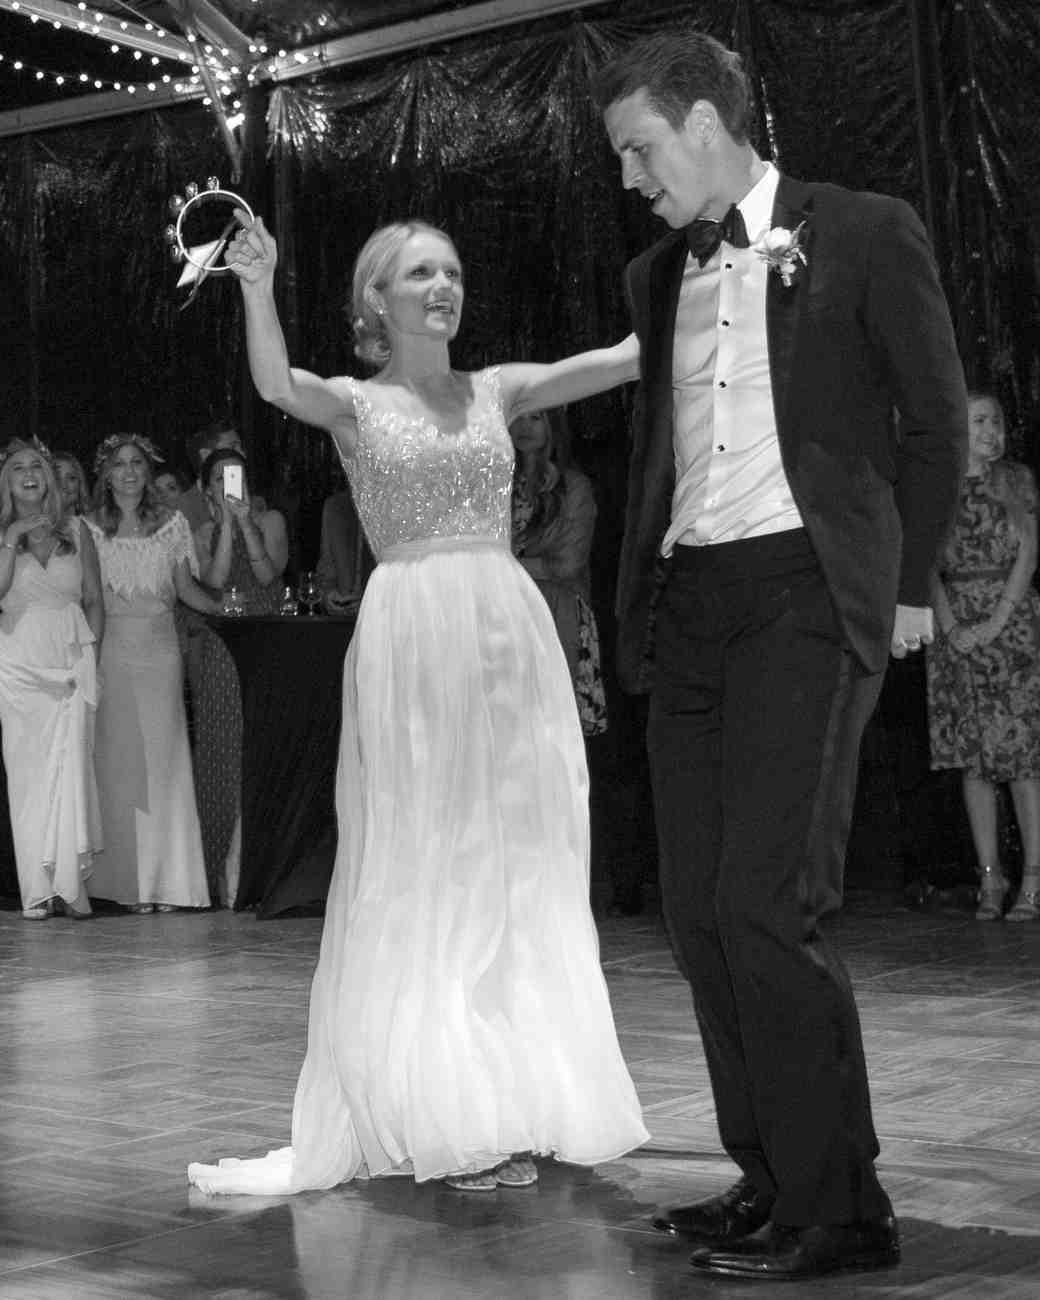 kristin-chris-wedding-firstdance-117-s112398-0116.jpg